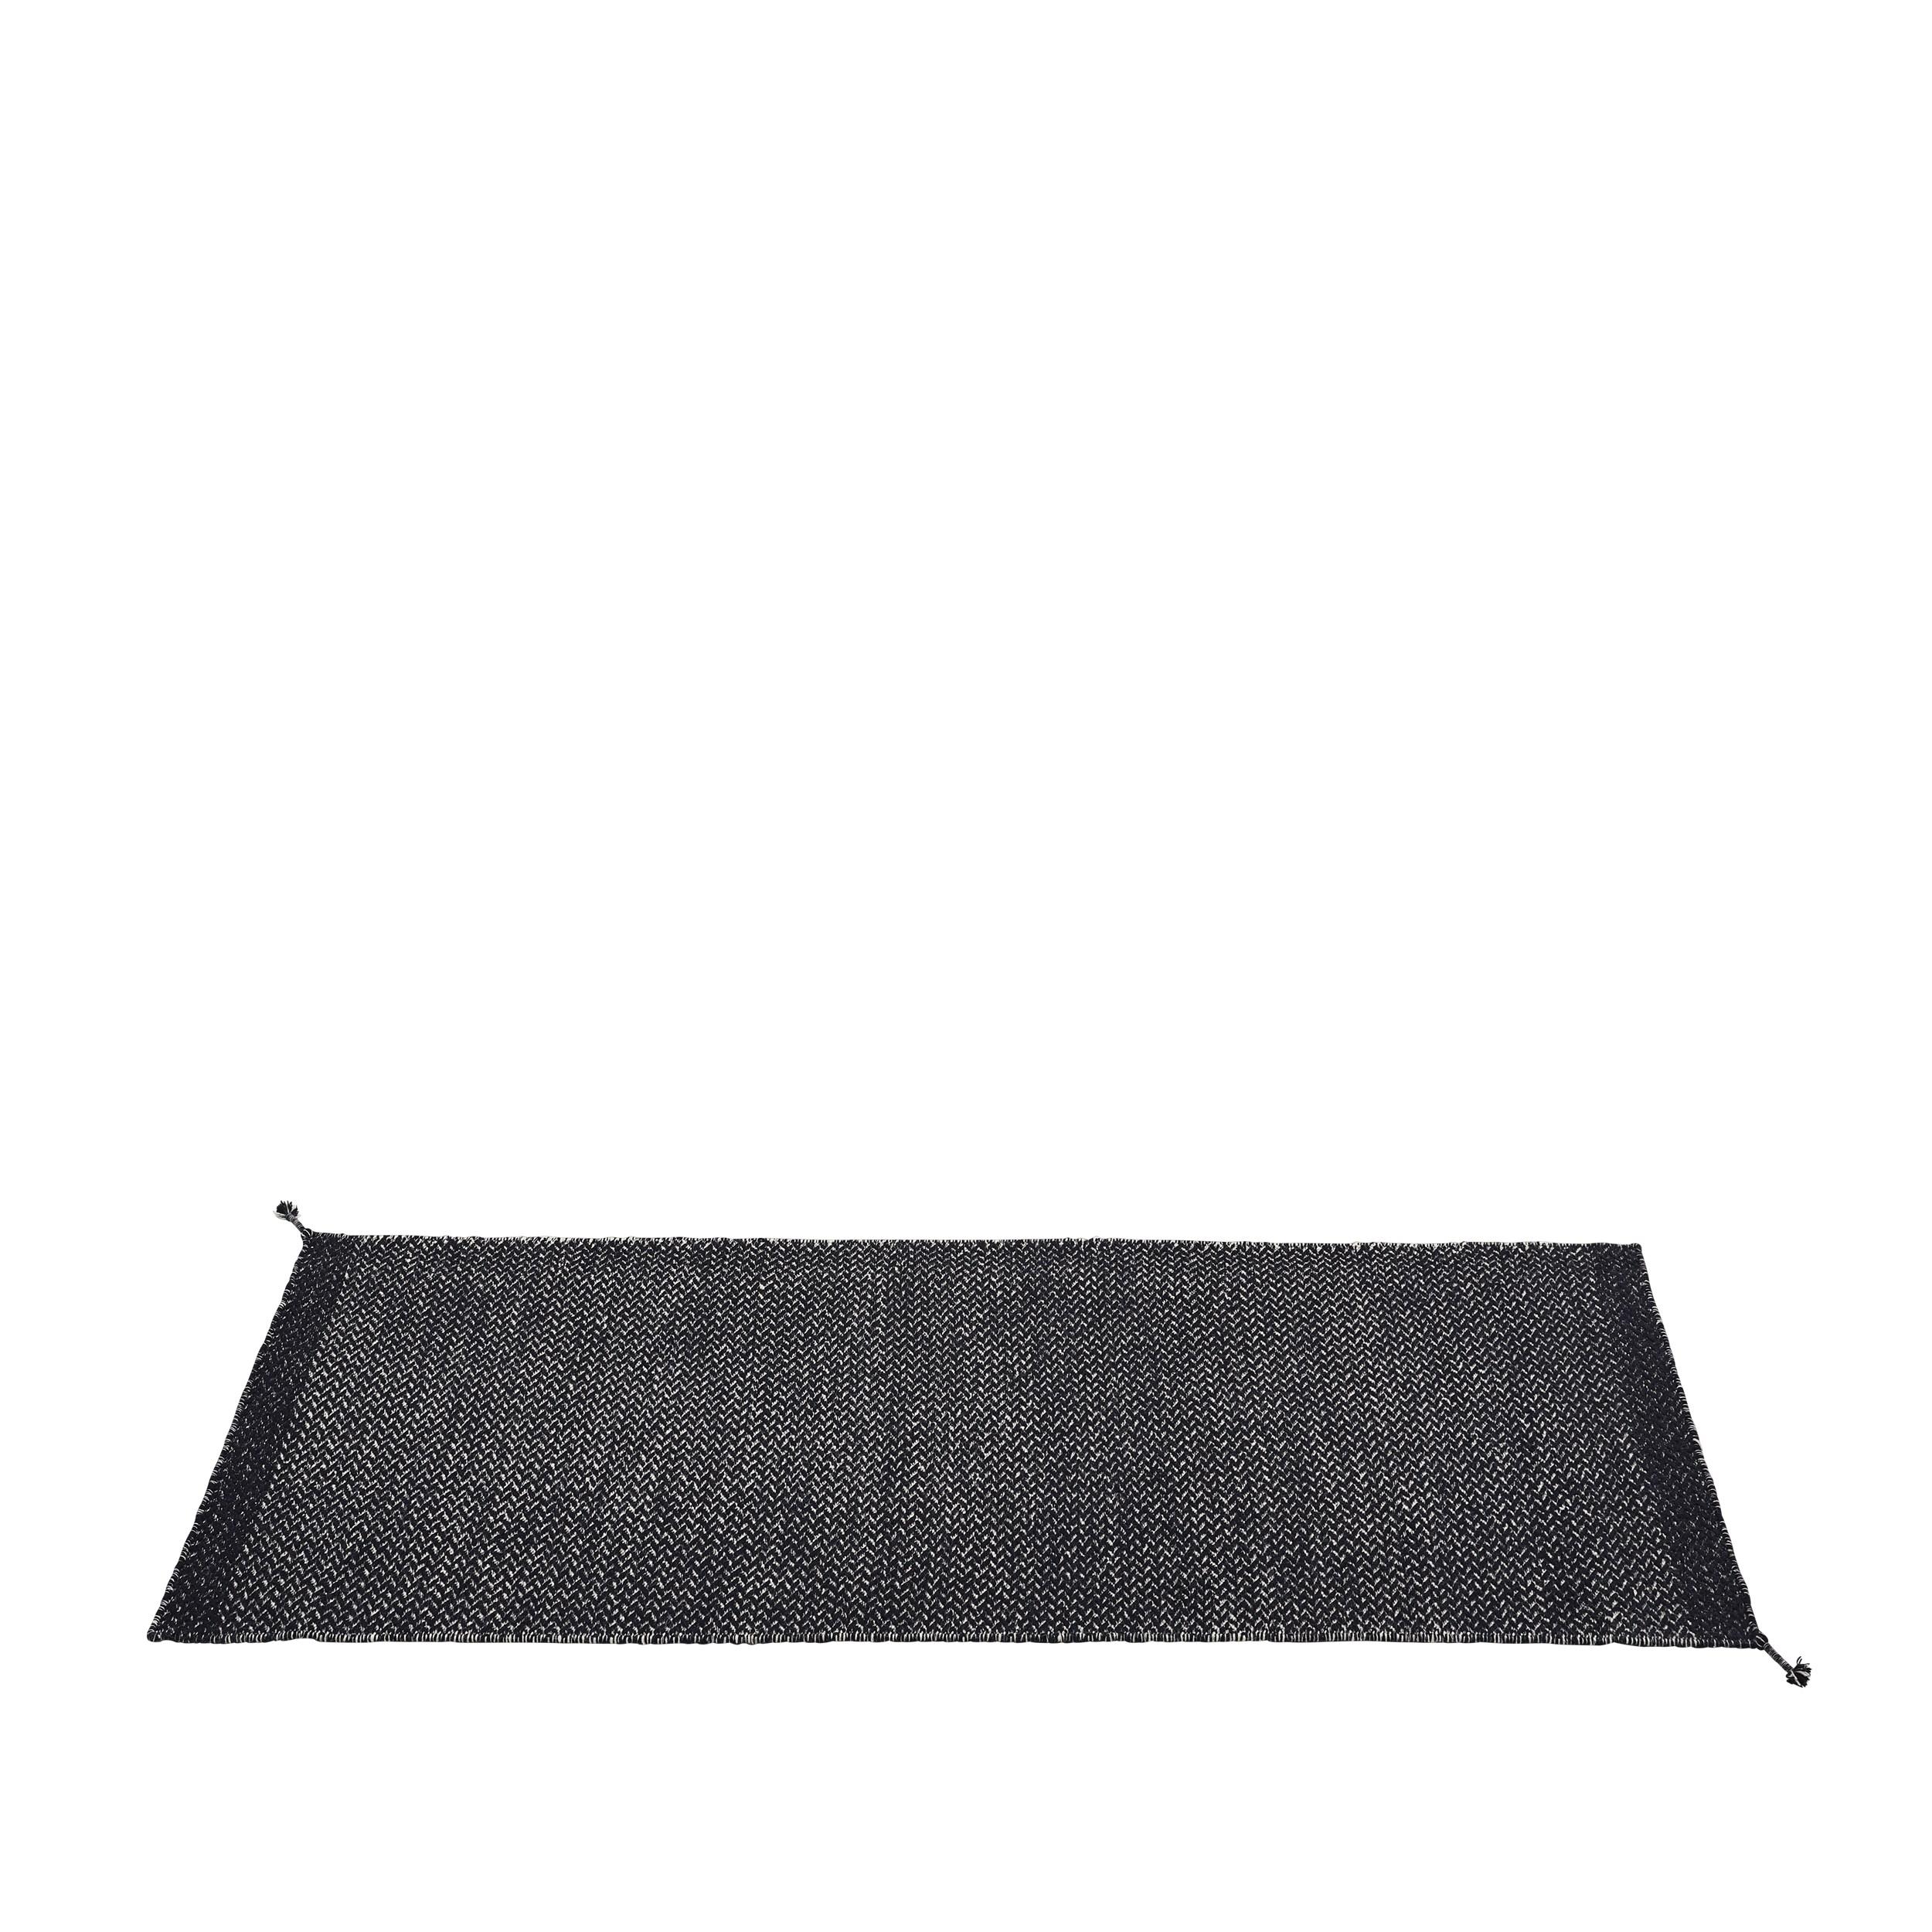 Ply rug 80 x 200 midnight blue